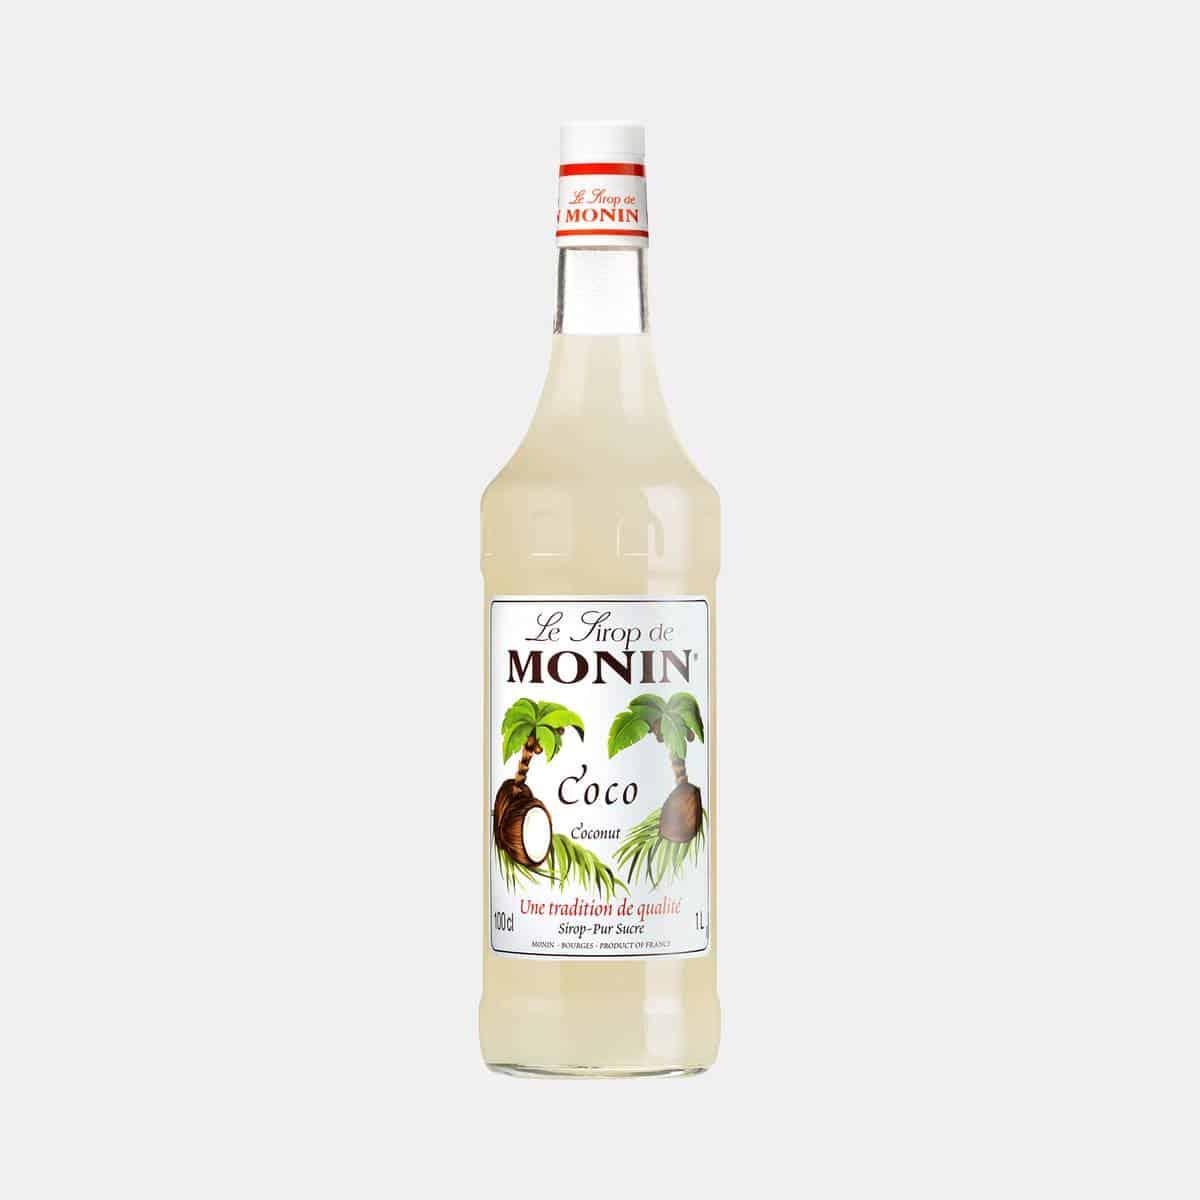 Monin Coconut Syrup 1 Liter Glass Bottle